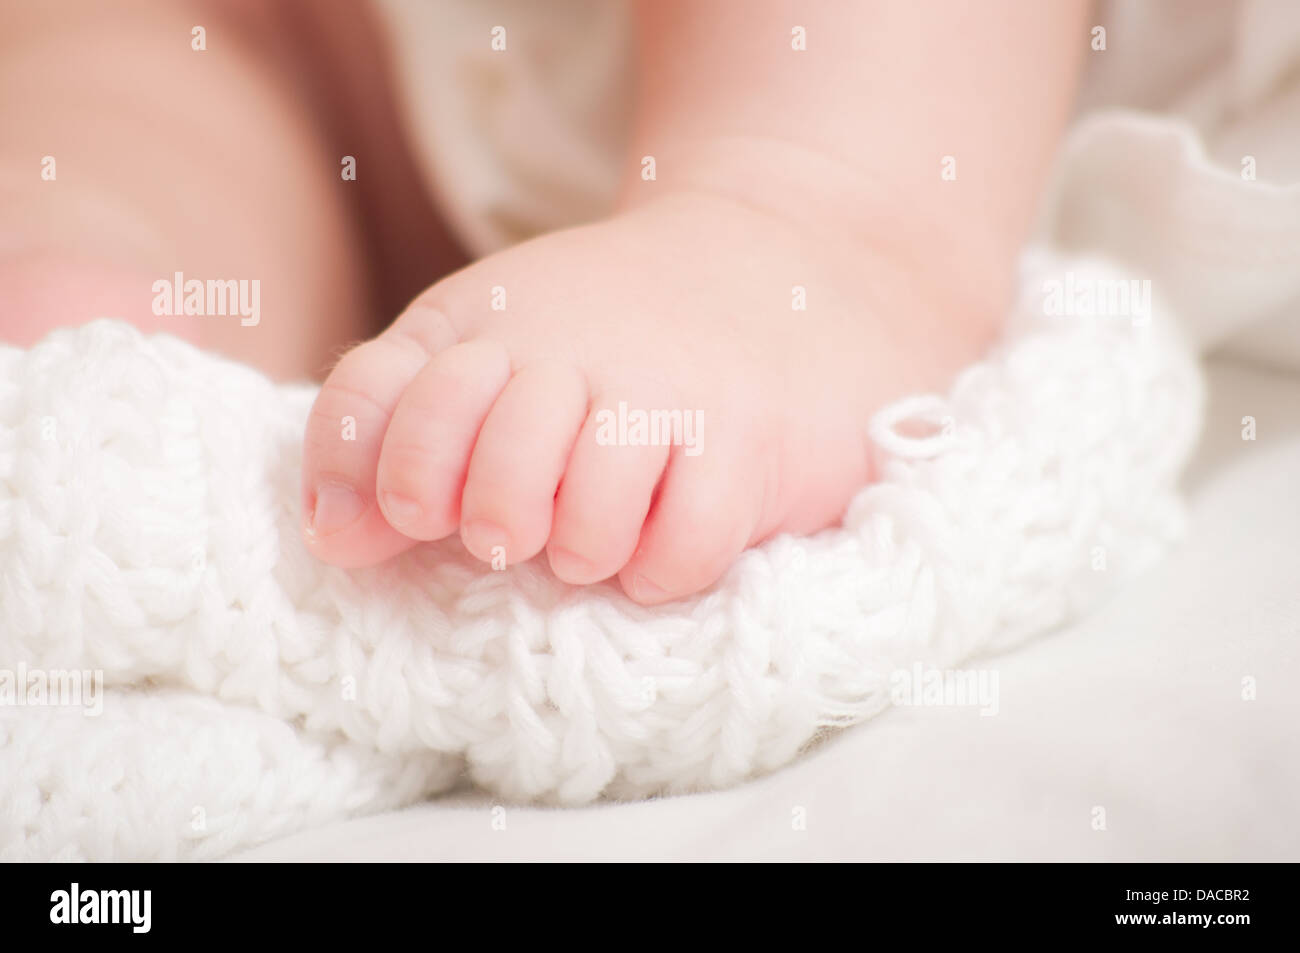 09925b1f4 Infant Boy Feet Stock Photos   Infant Boy Feet Stock Images - Page ...